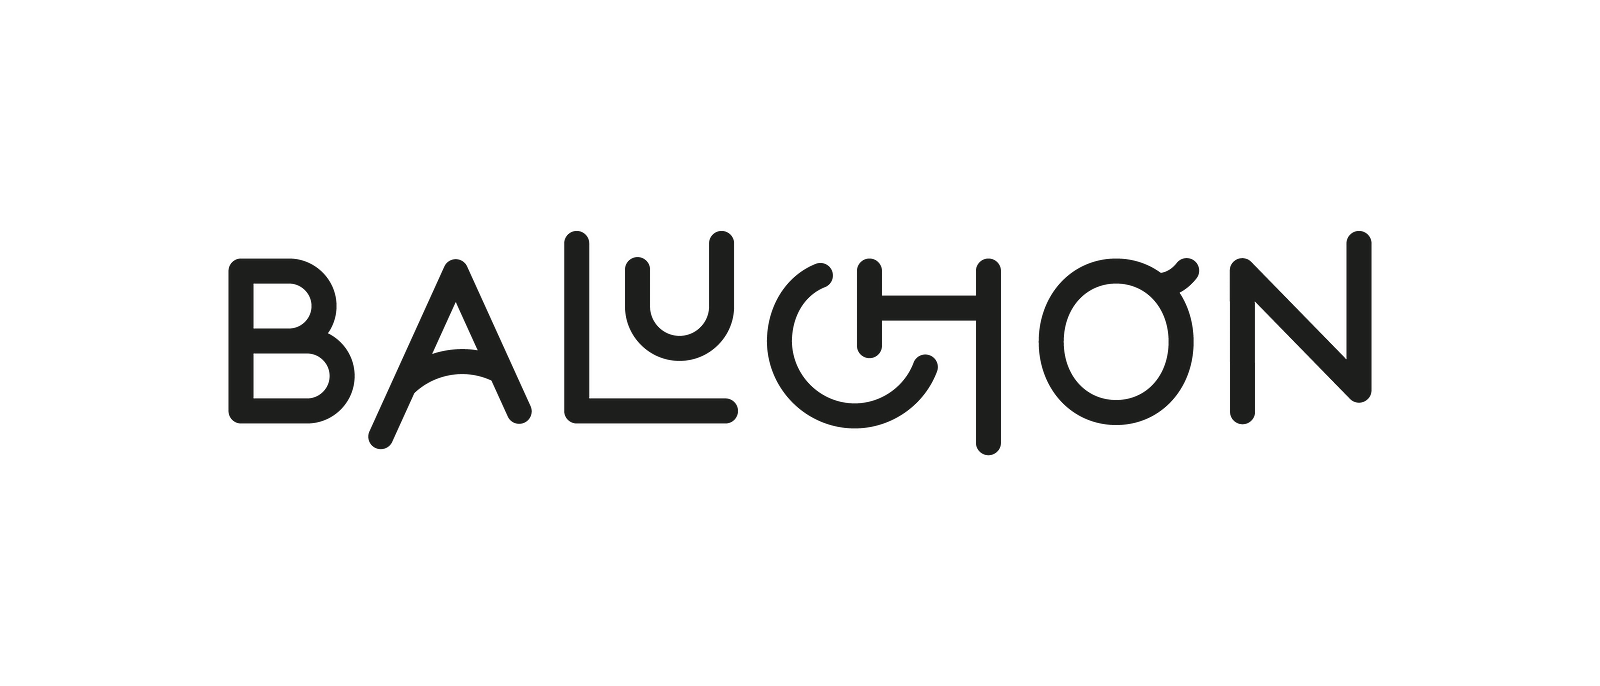 Logo baluchon